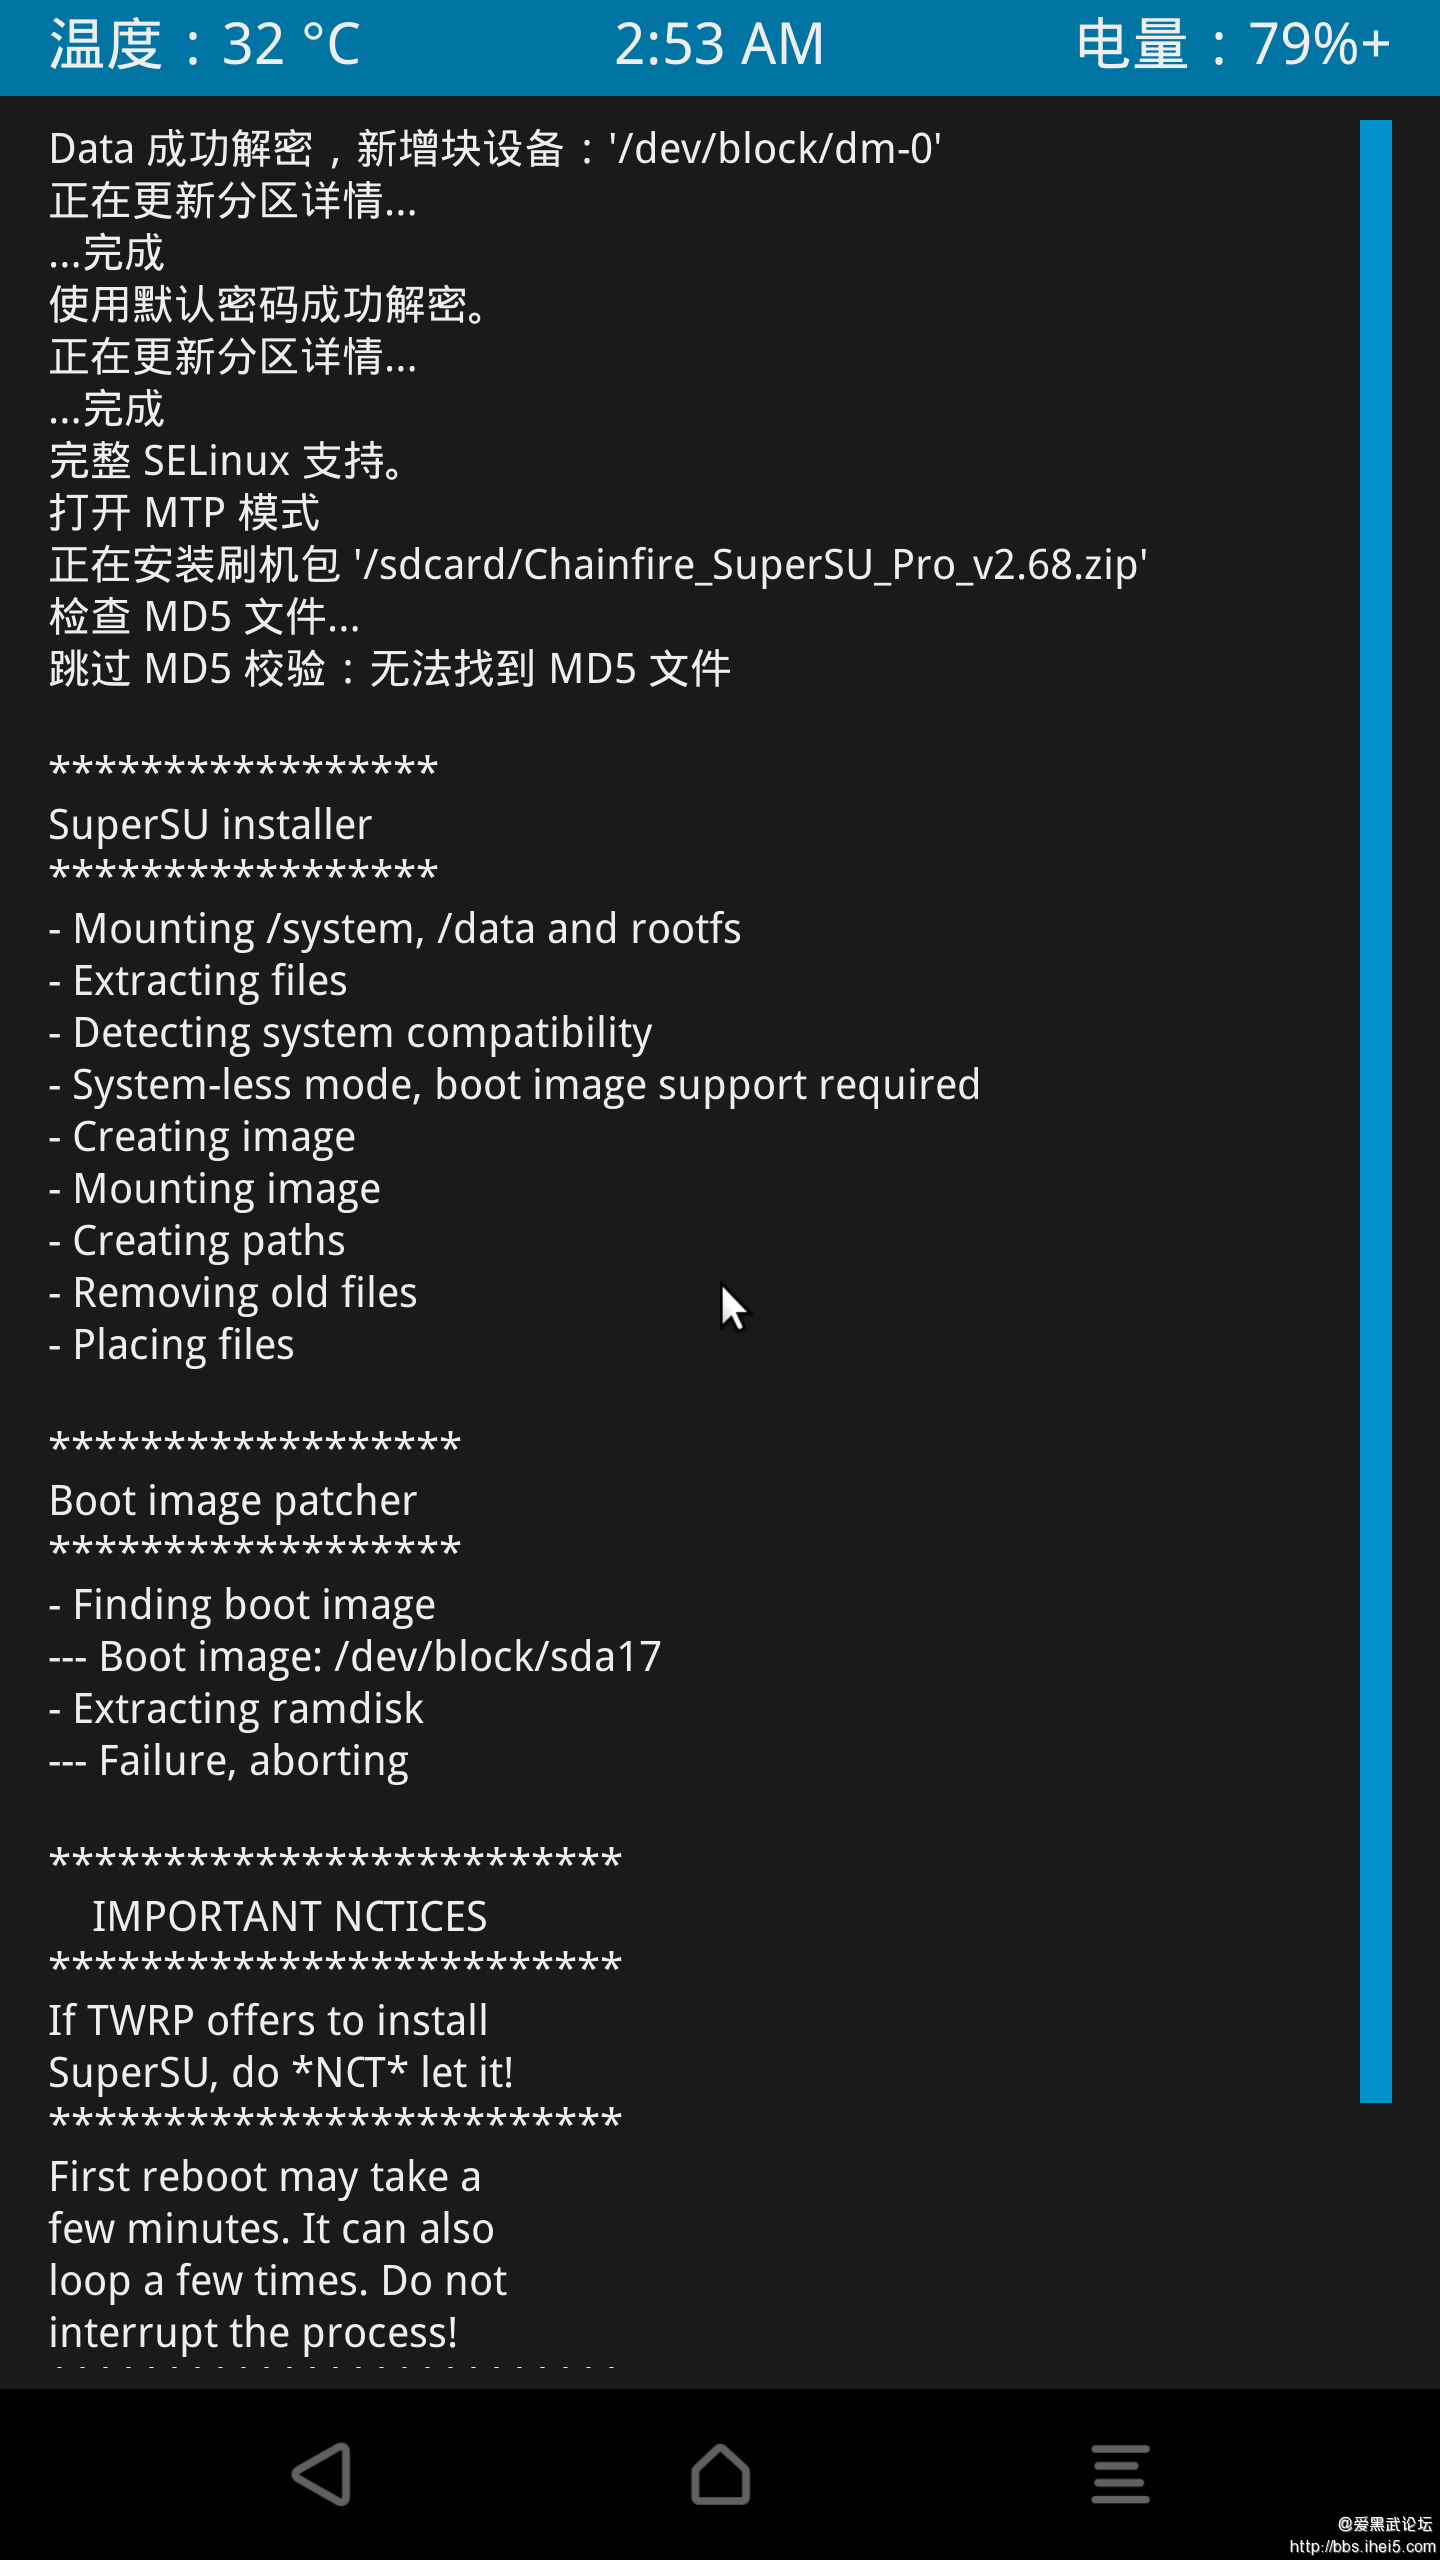 Screenshot_2016-09-25-02-53-37.png